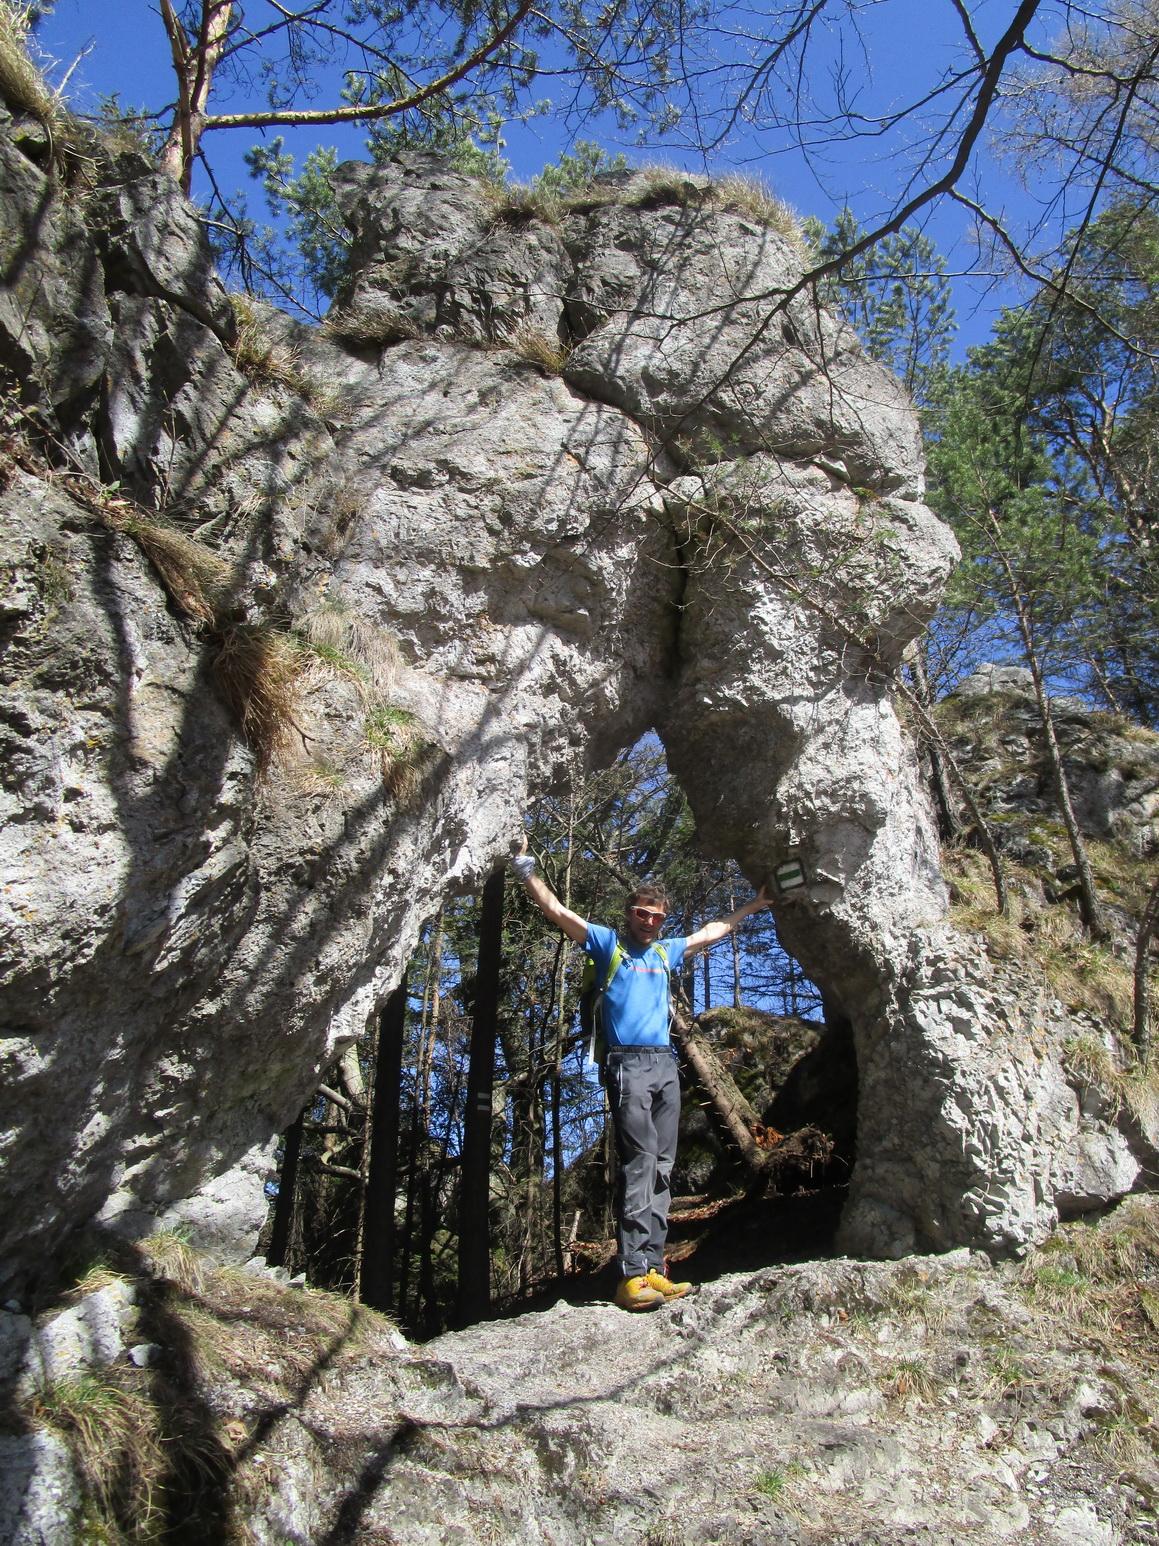 hrebenom-sedlo-branisko-slubica-1129m-n-m-